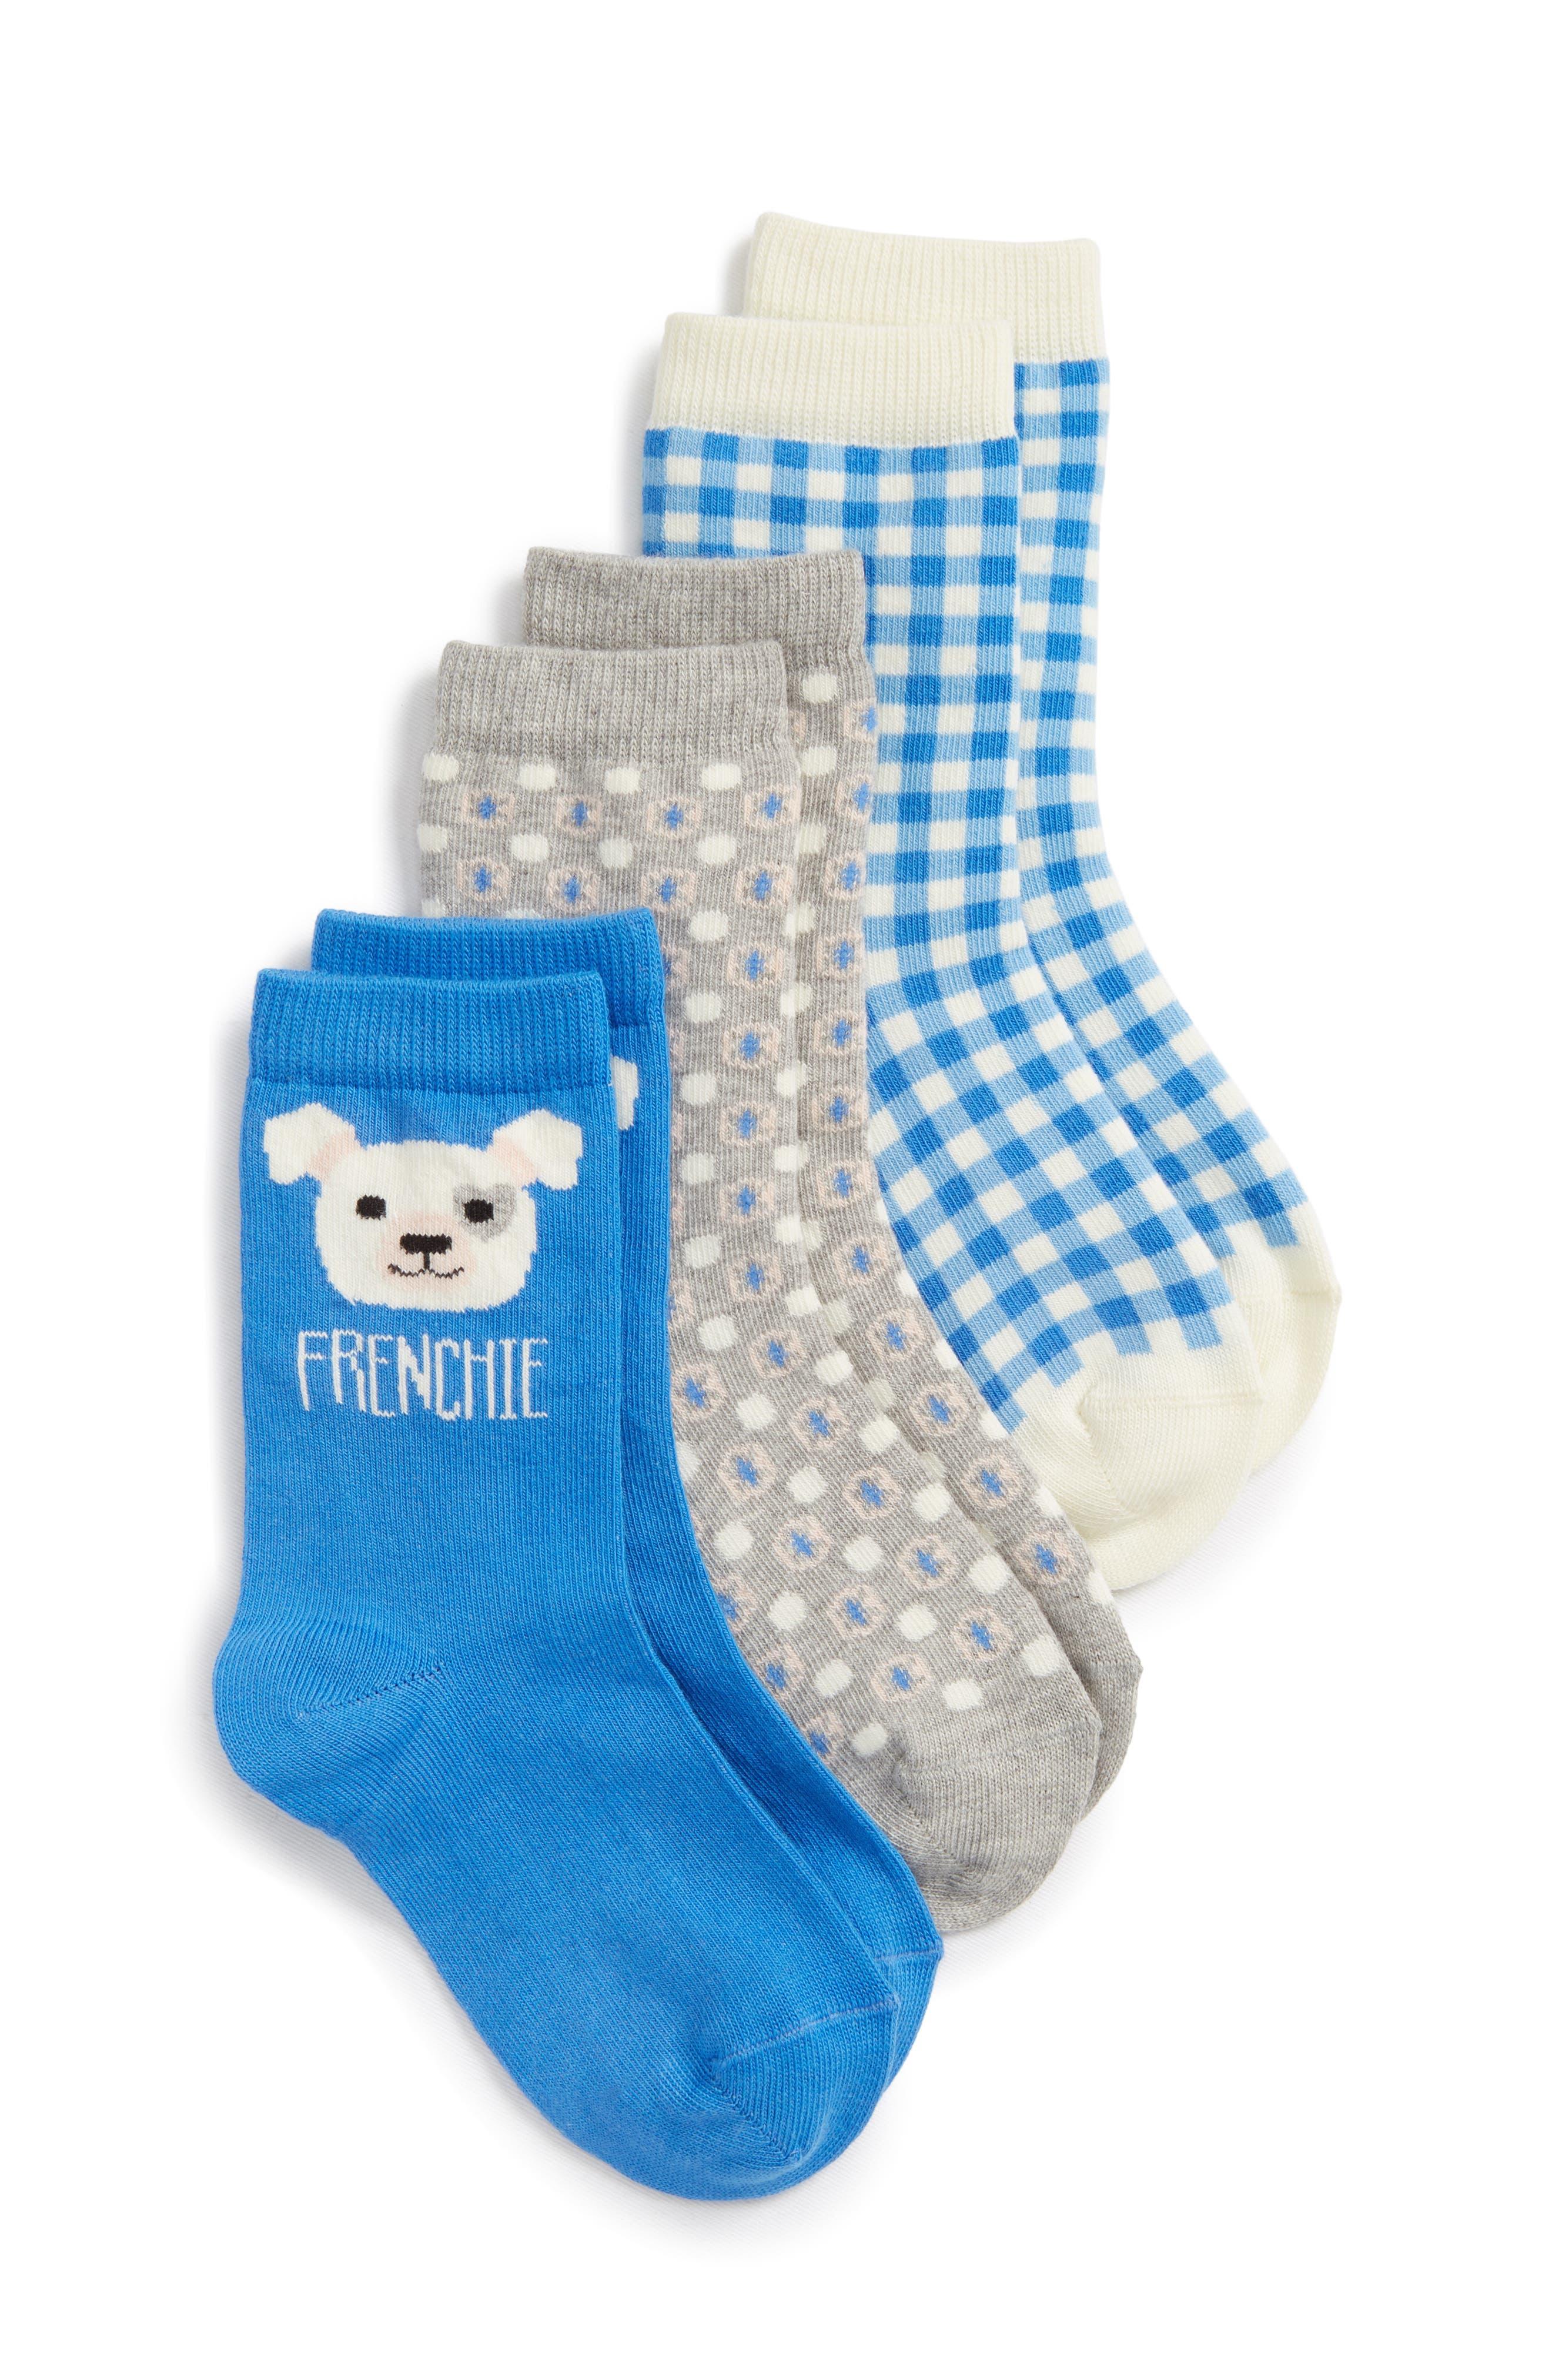 Girls Tucker  Tate Frenchie 3Pack Crew Socks Size 925  Blue